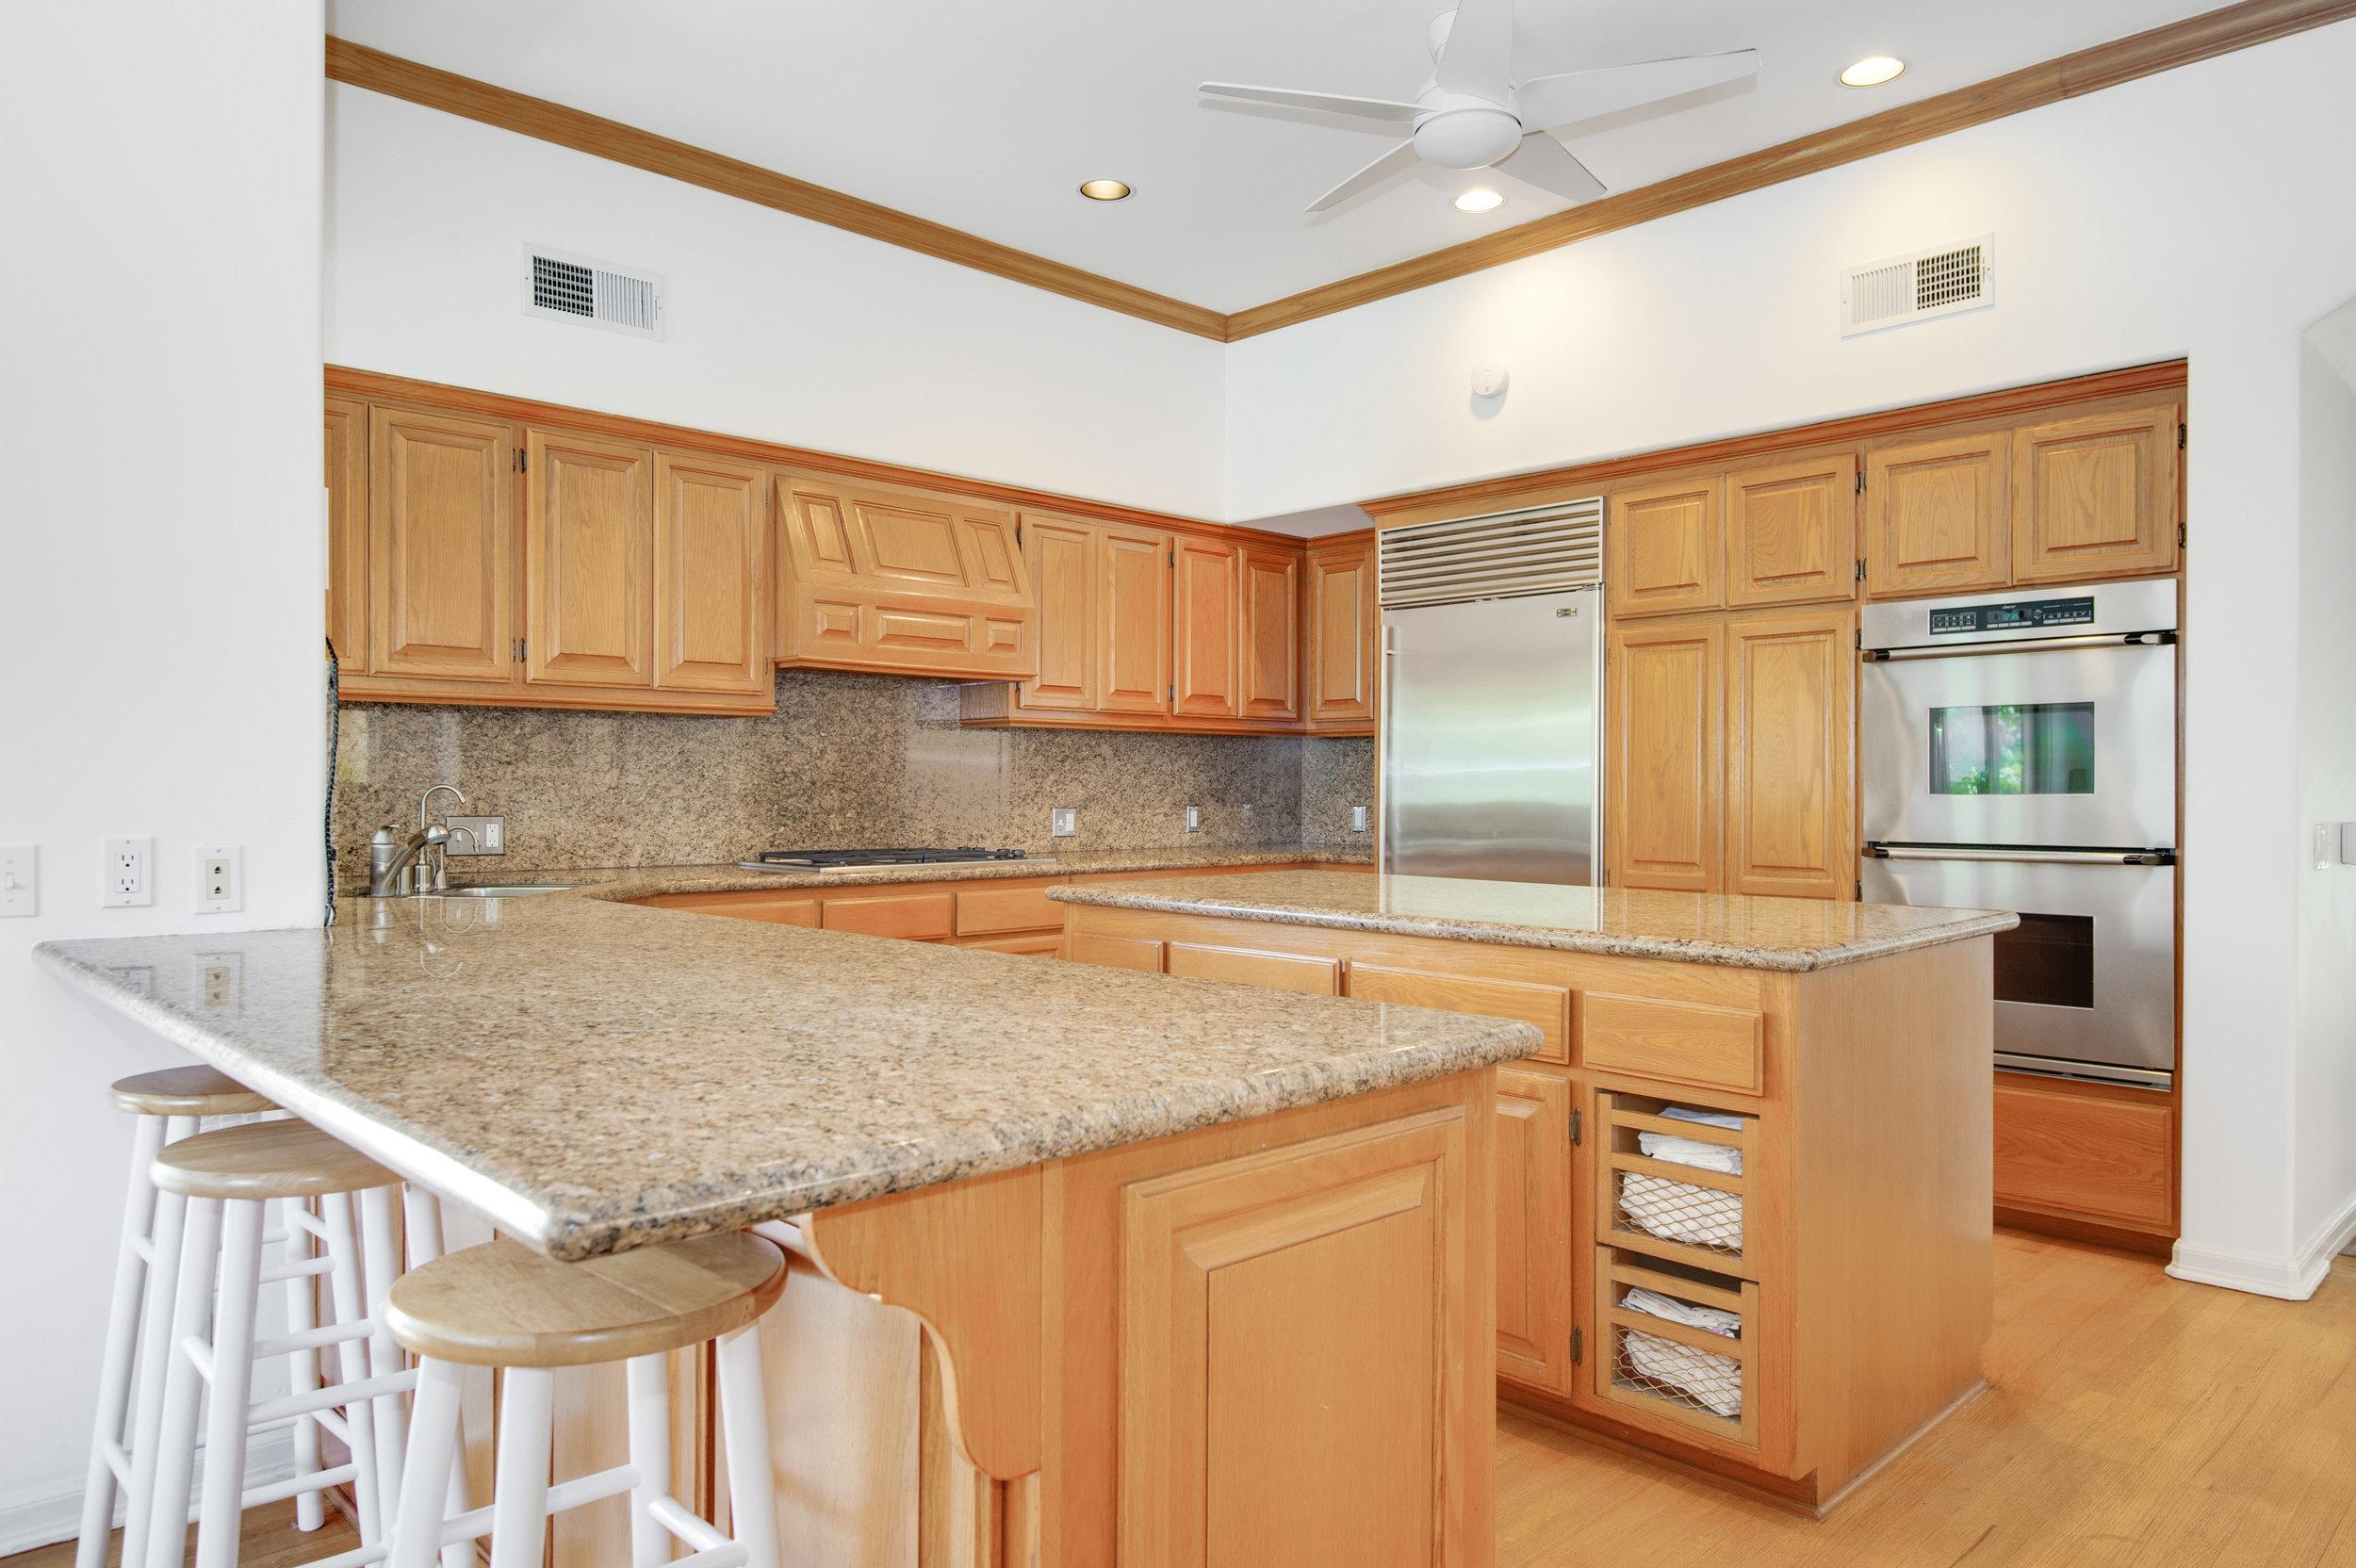 009 Kitchen Malibu For Sale Lease The Malibu Life Team Luxury Real Estate.jpg